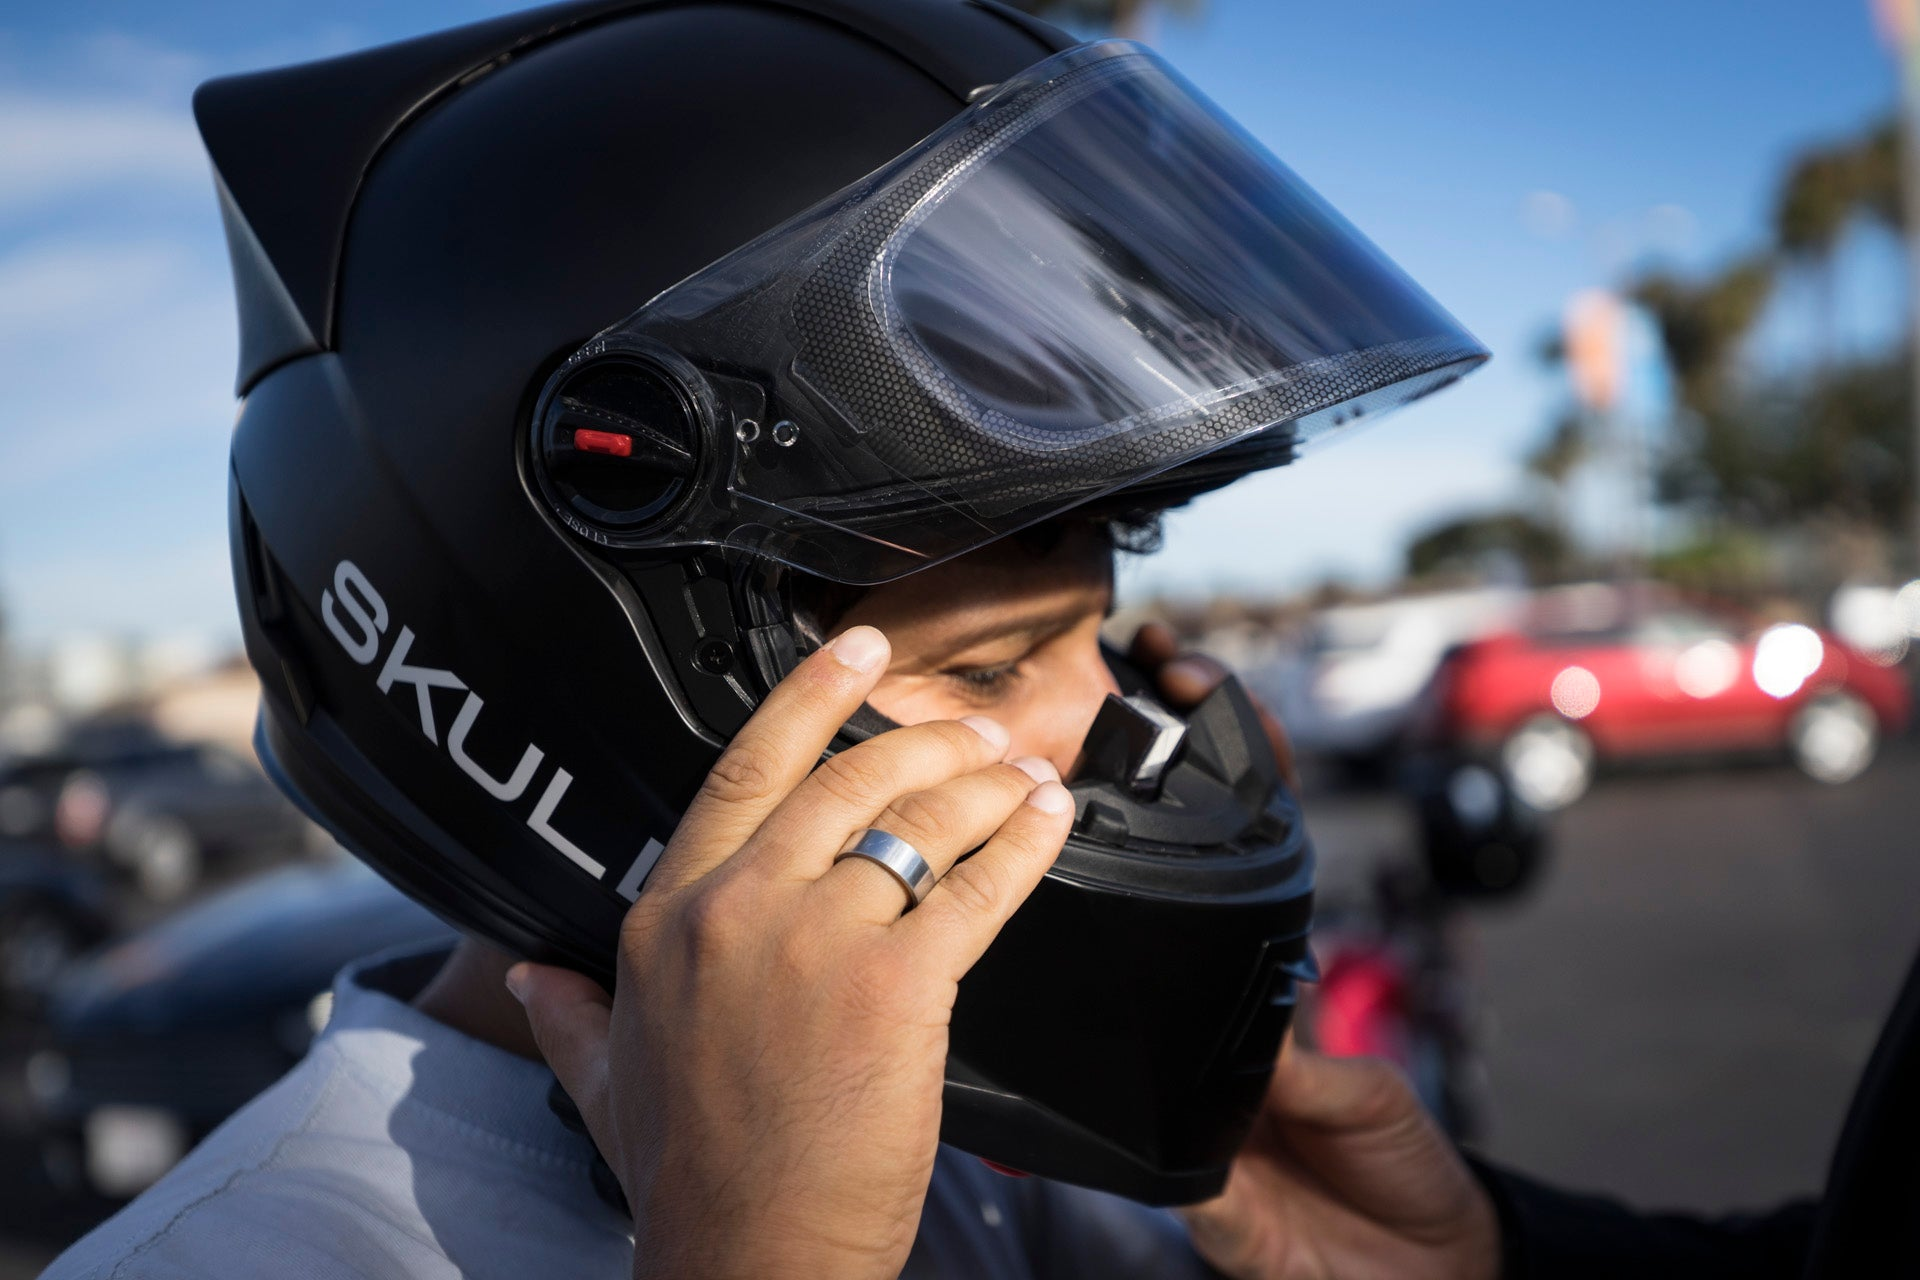 skully ar 1 helmet hands on the world 39 s first hud motorcycle helmet gizmodo australia. Black Bedroom Furniture Sets. Home Design Ideas